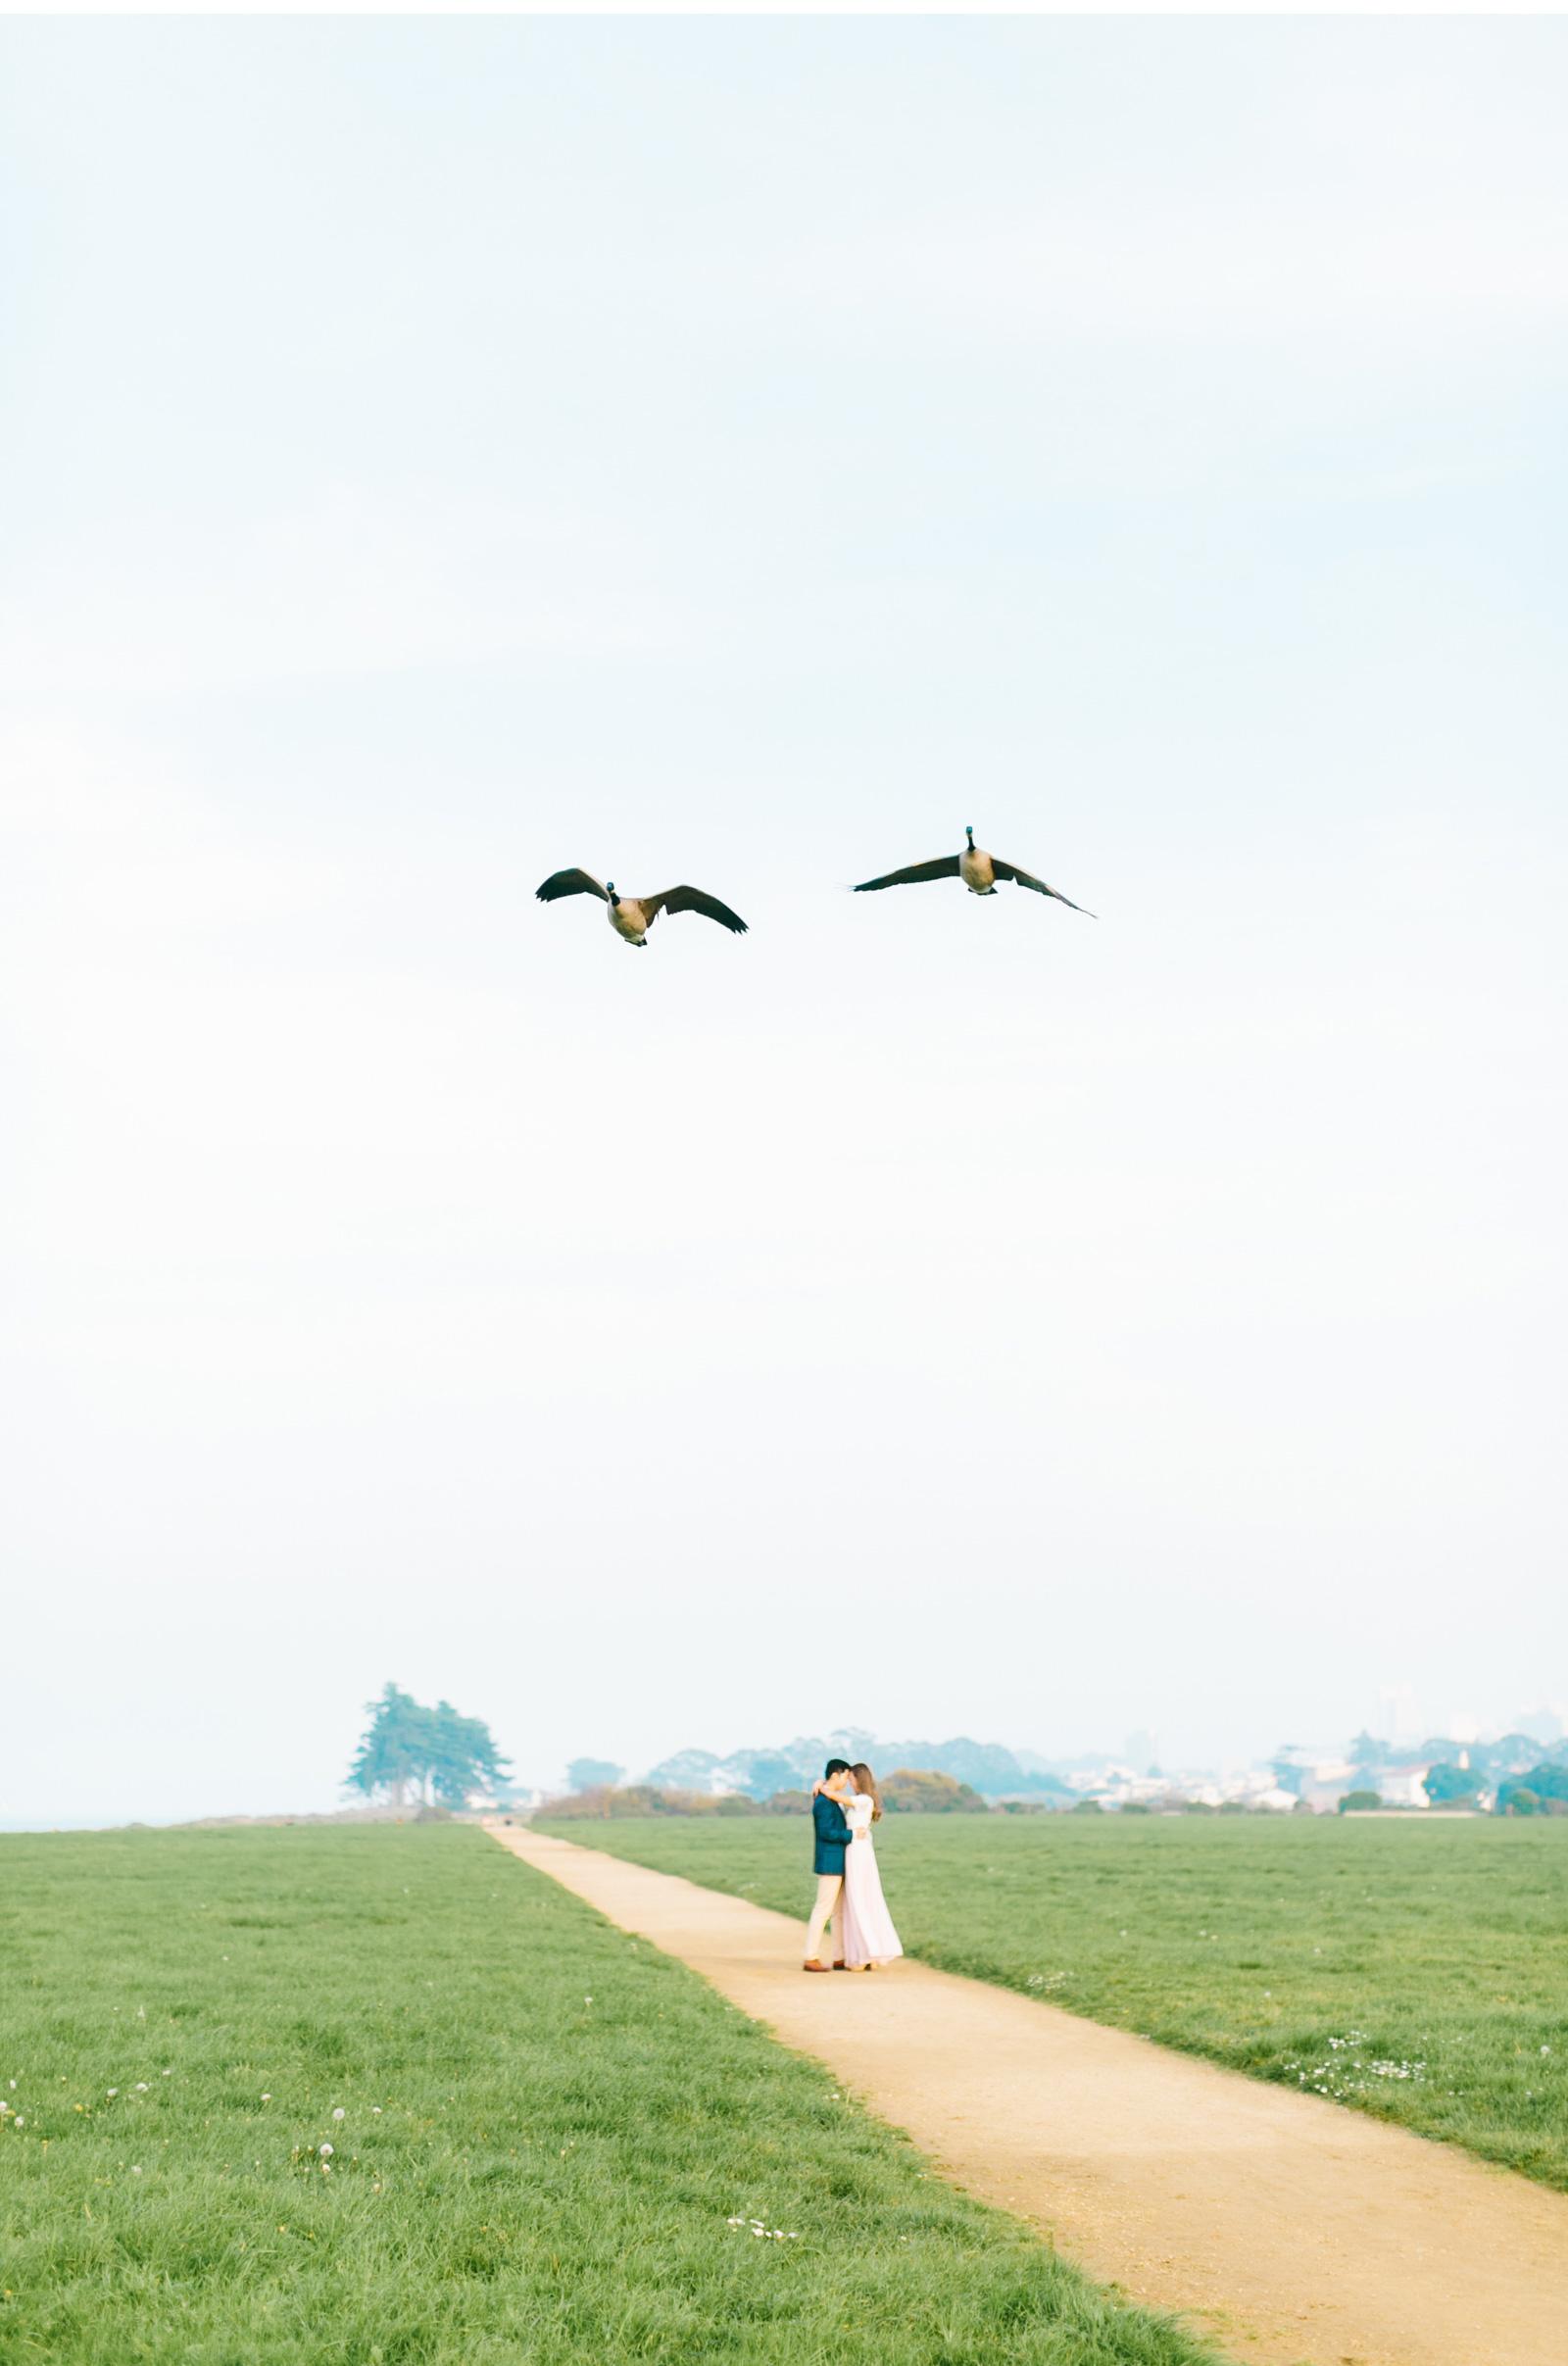 Malibu-Wedding-Venues-Natalie-Schutt-Photography-Style-Me-Pretty-Top-Weddings_19.jpg